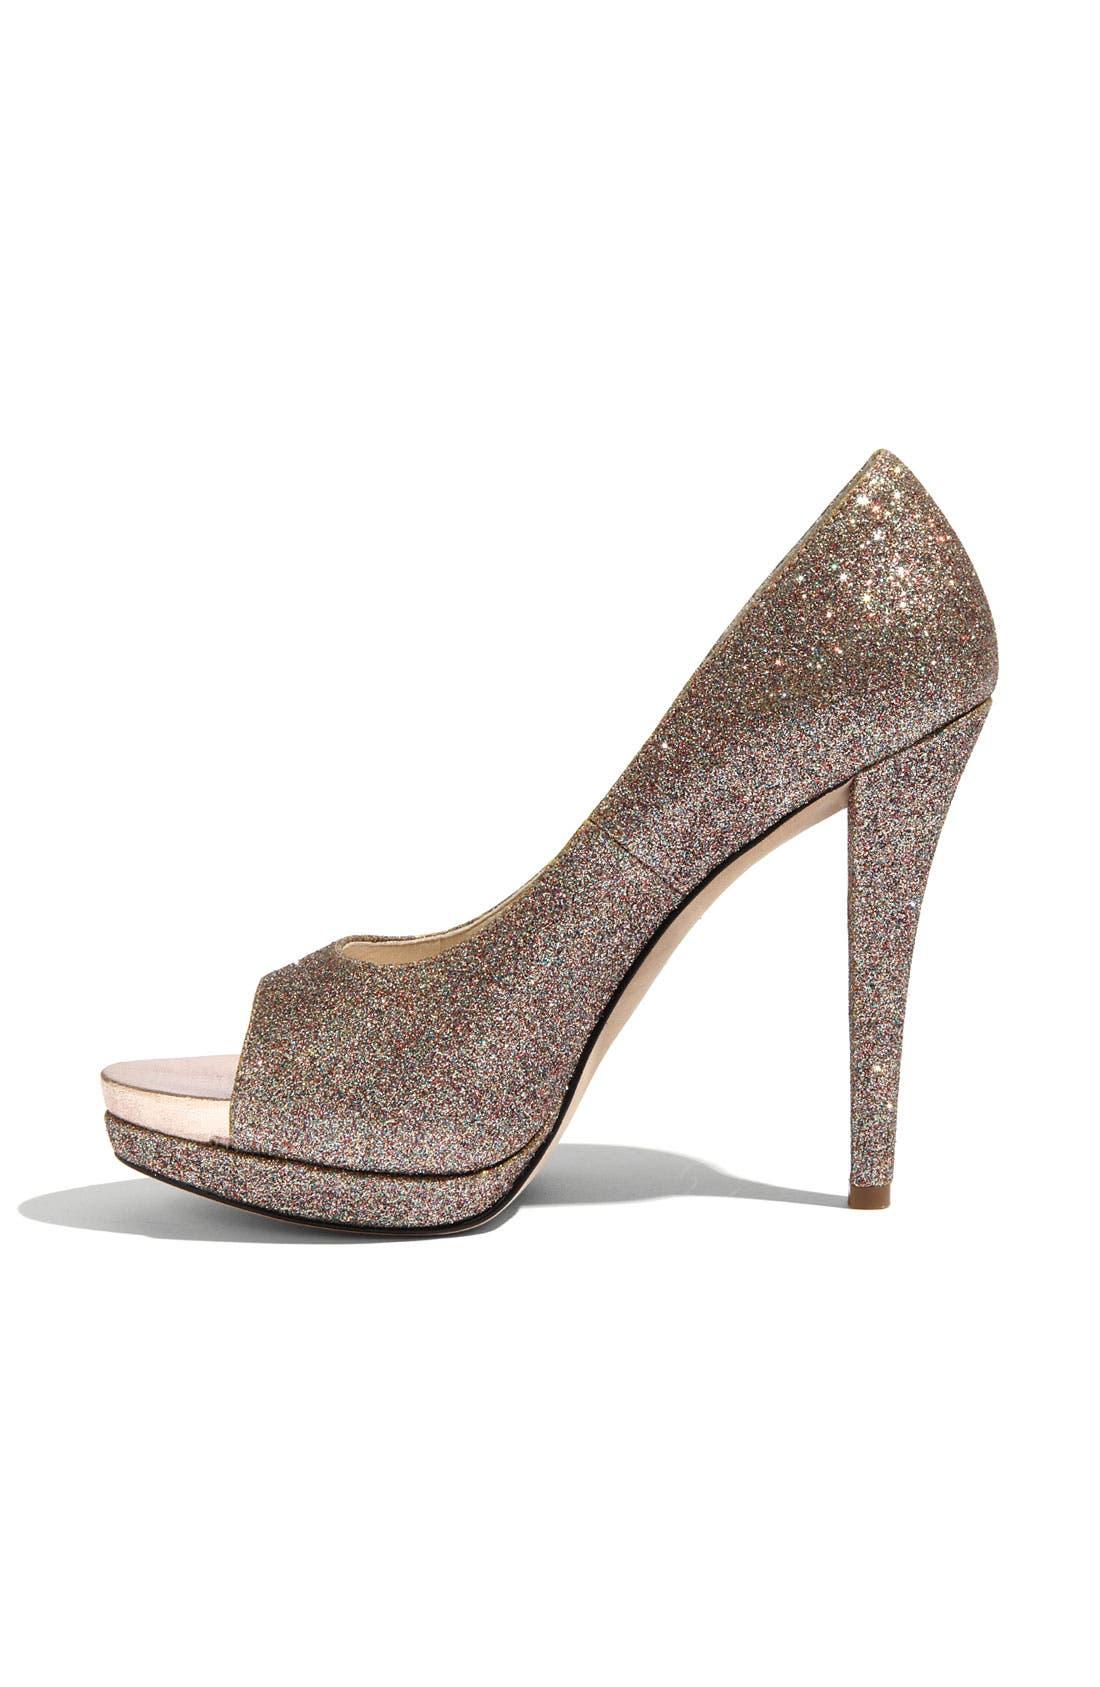 Footwear 'Selima' Peep Toe Pump,                             Alternate thumbnail 23, color,